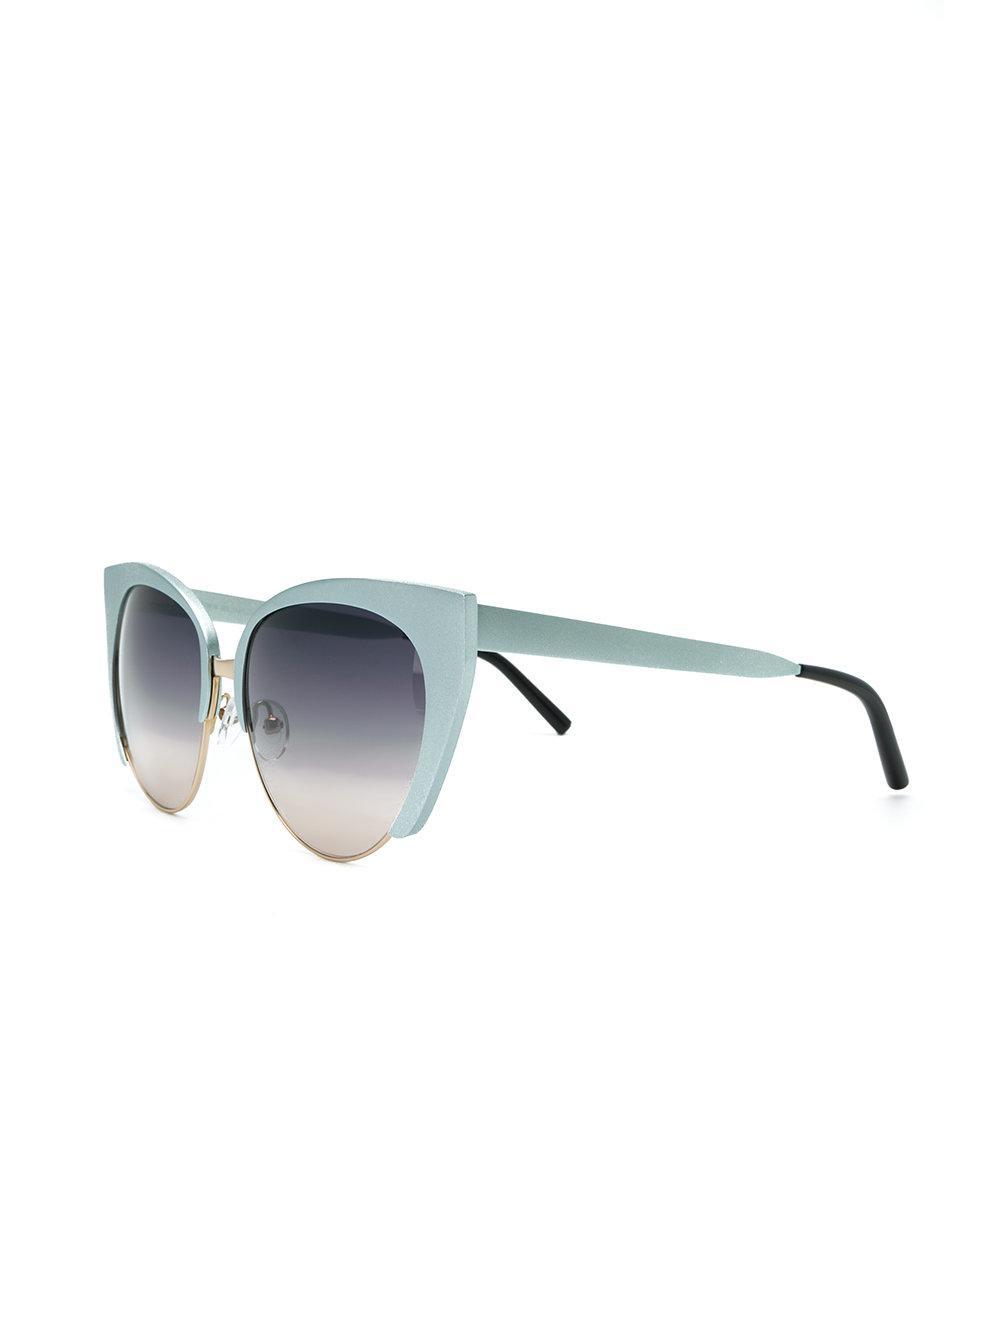 3ebb263a25d1 Matthew Williamson - Blue X Linda Farrow Cat-eye Sunglasses - Lyst. View  fullscreen